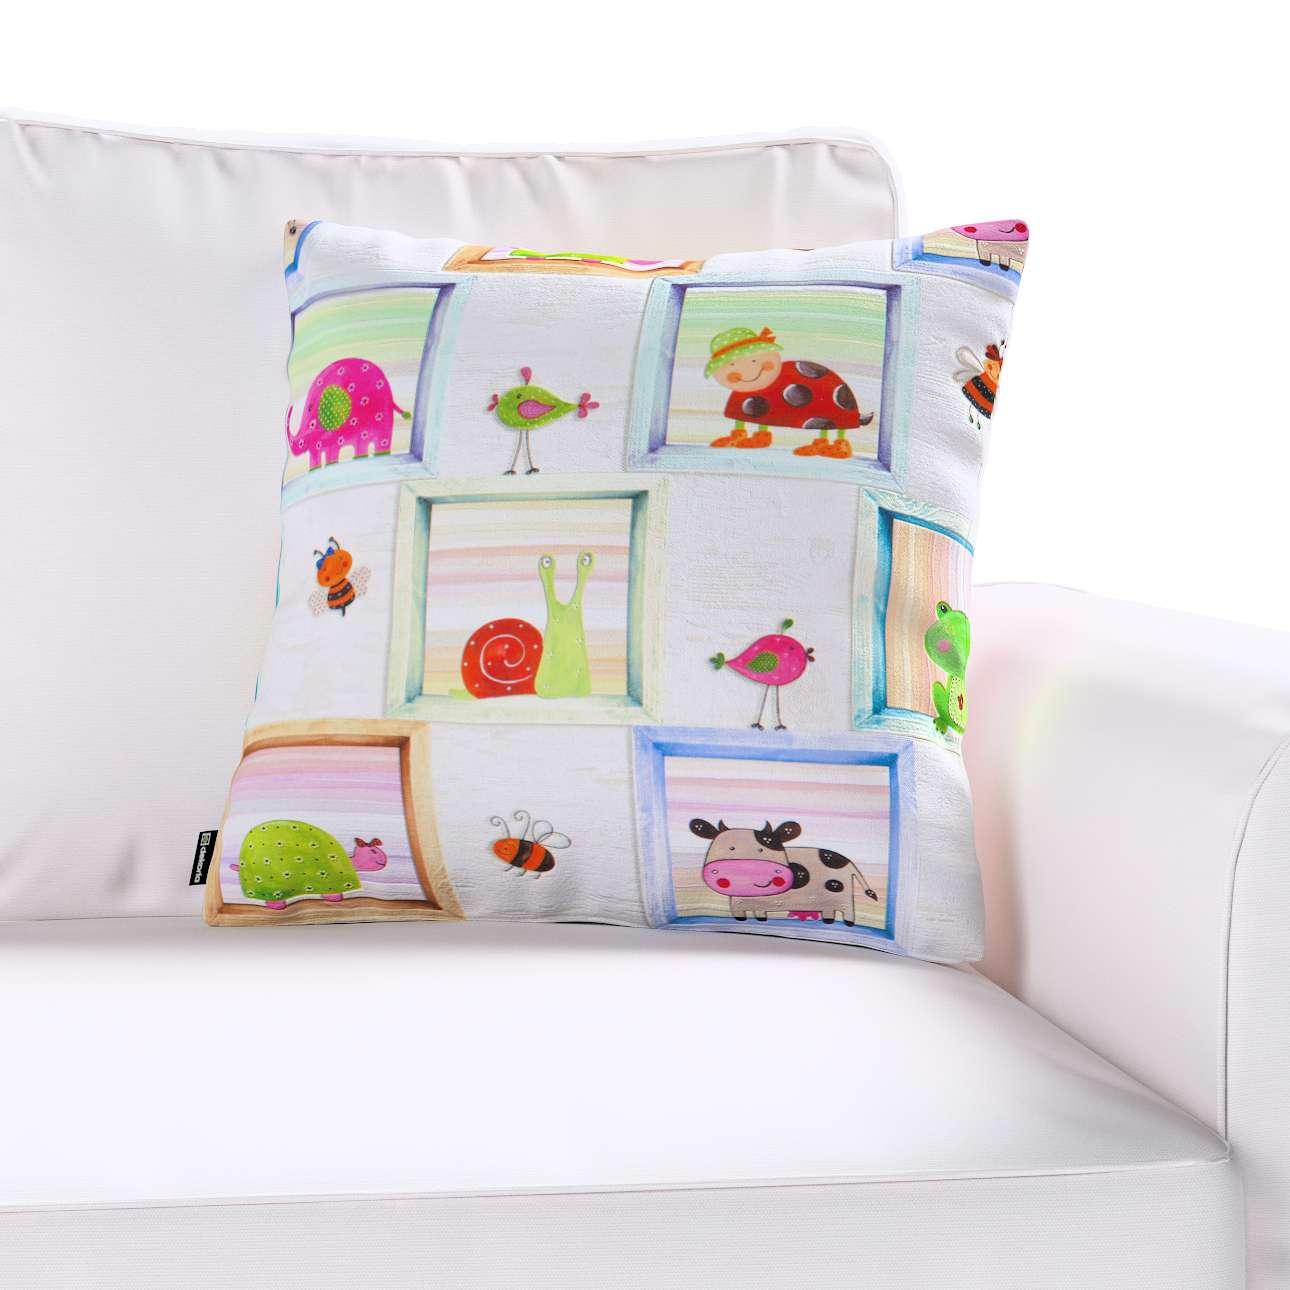 Poszewka Kinga na poduszkę w kolekcji Little World, tkanina: 151-04